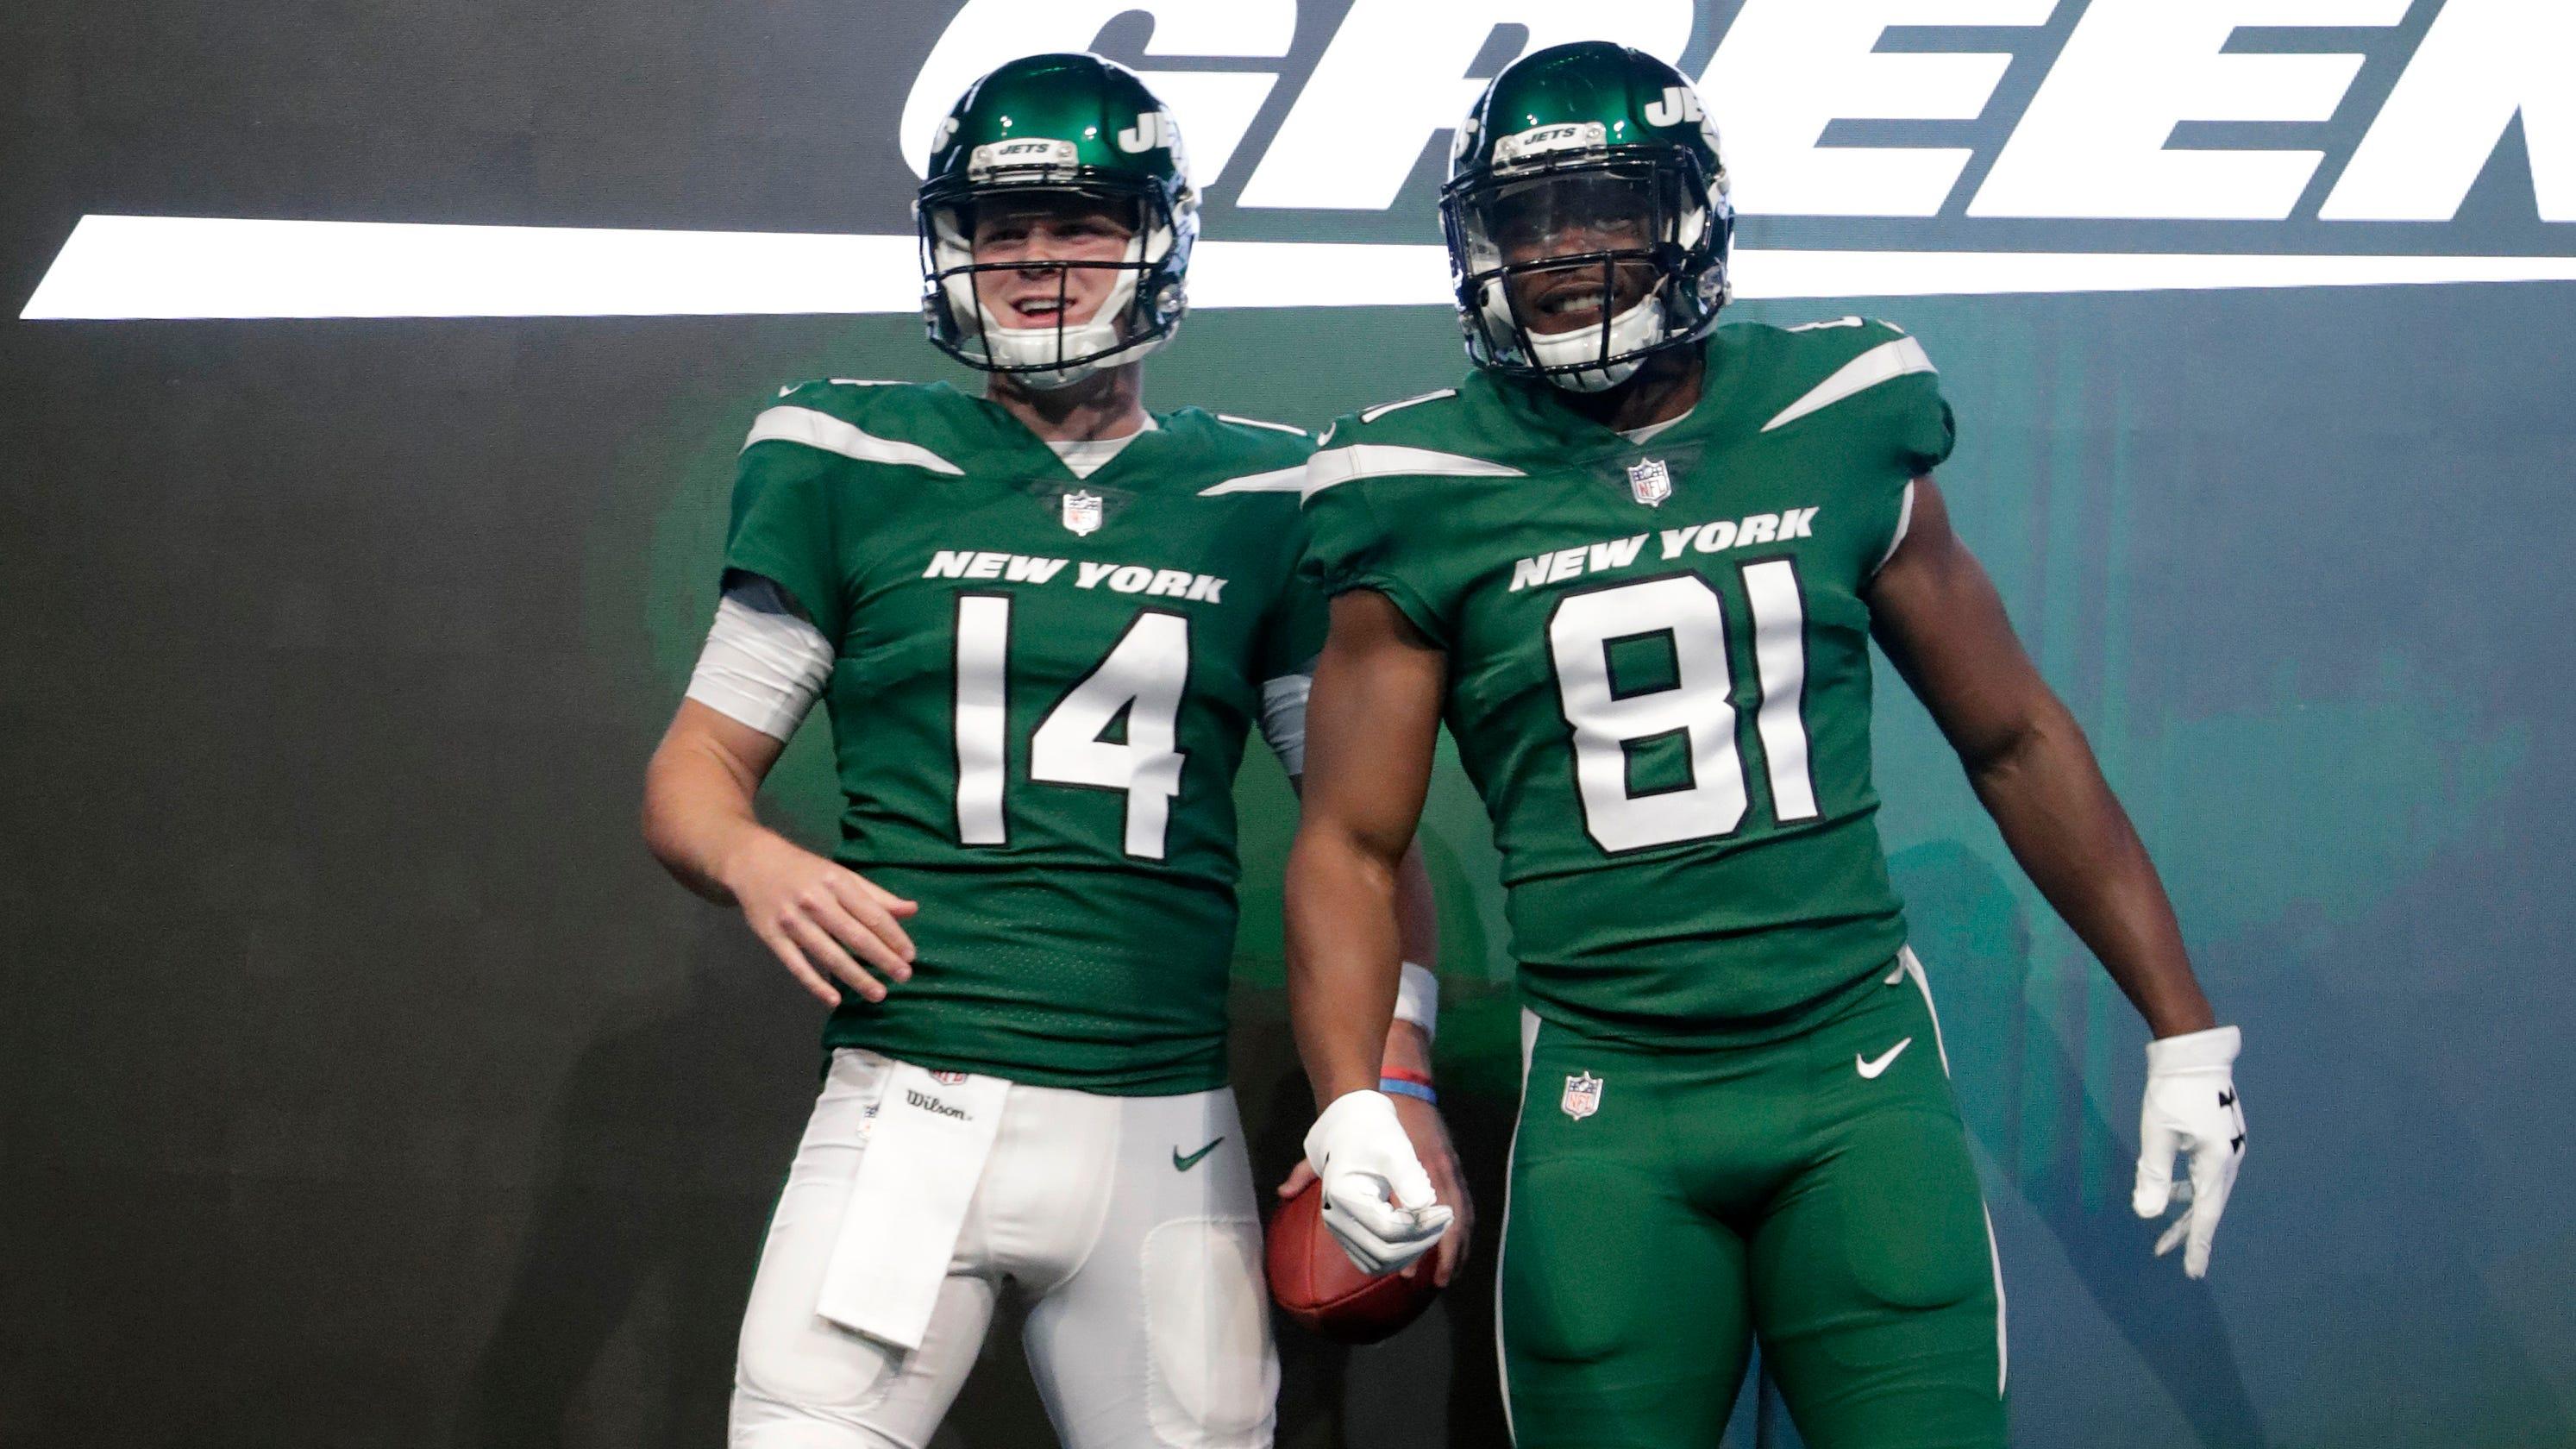 e2a67cad8aa Jets uniforms photos: Team unveils new-look jerseys, helmets, pants